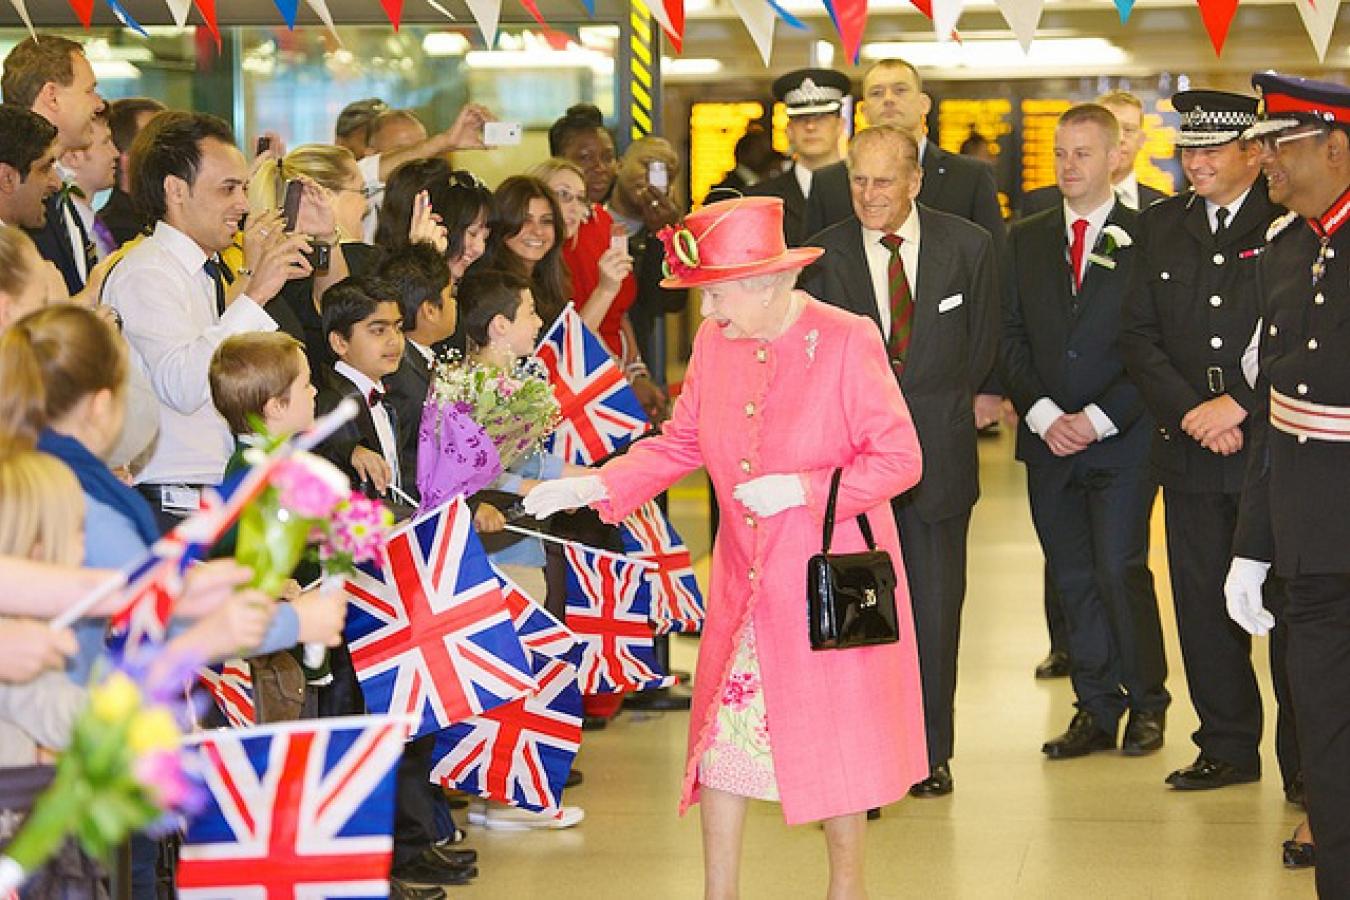 Queen Elizabeth II of UK Day 194 - West Midlands Police - Royal Diamond Jubilee Visit